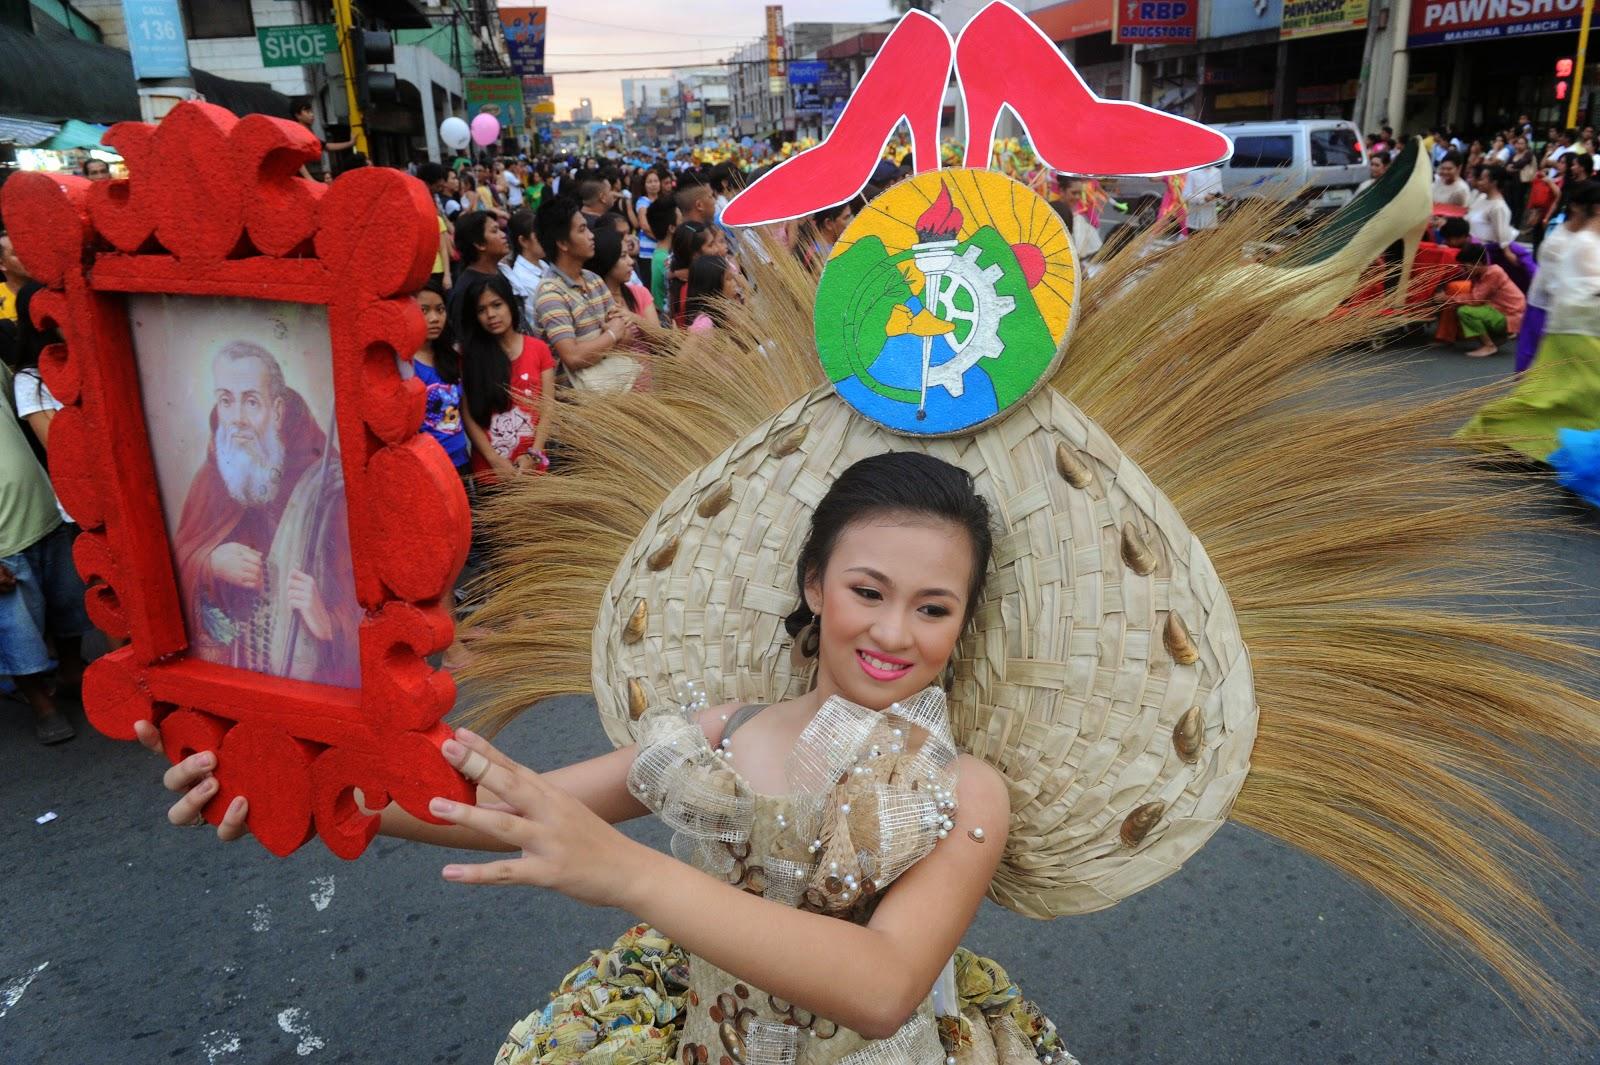 Marikina Events - Sapatos  (shoe) Festival 2014